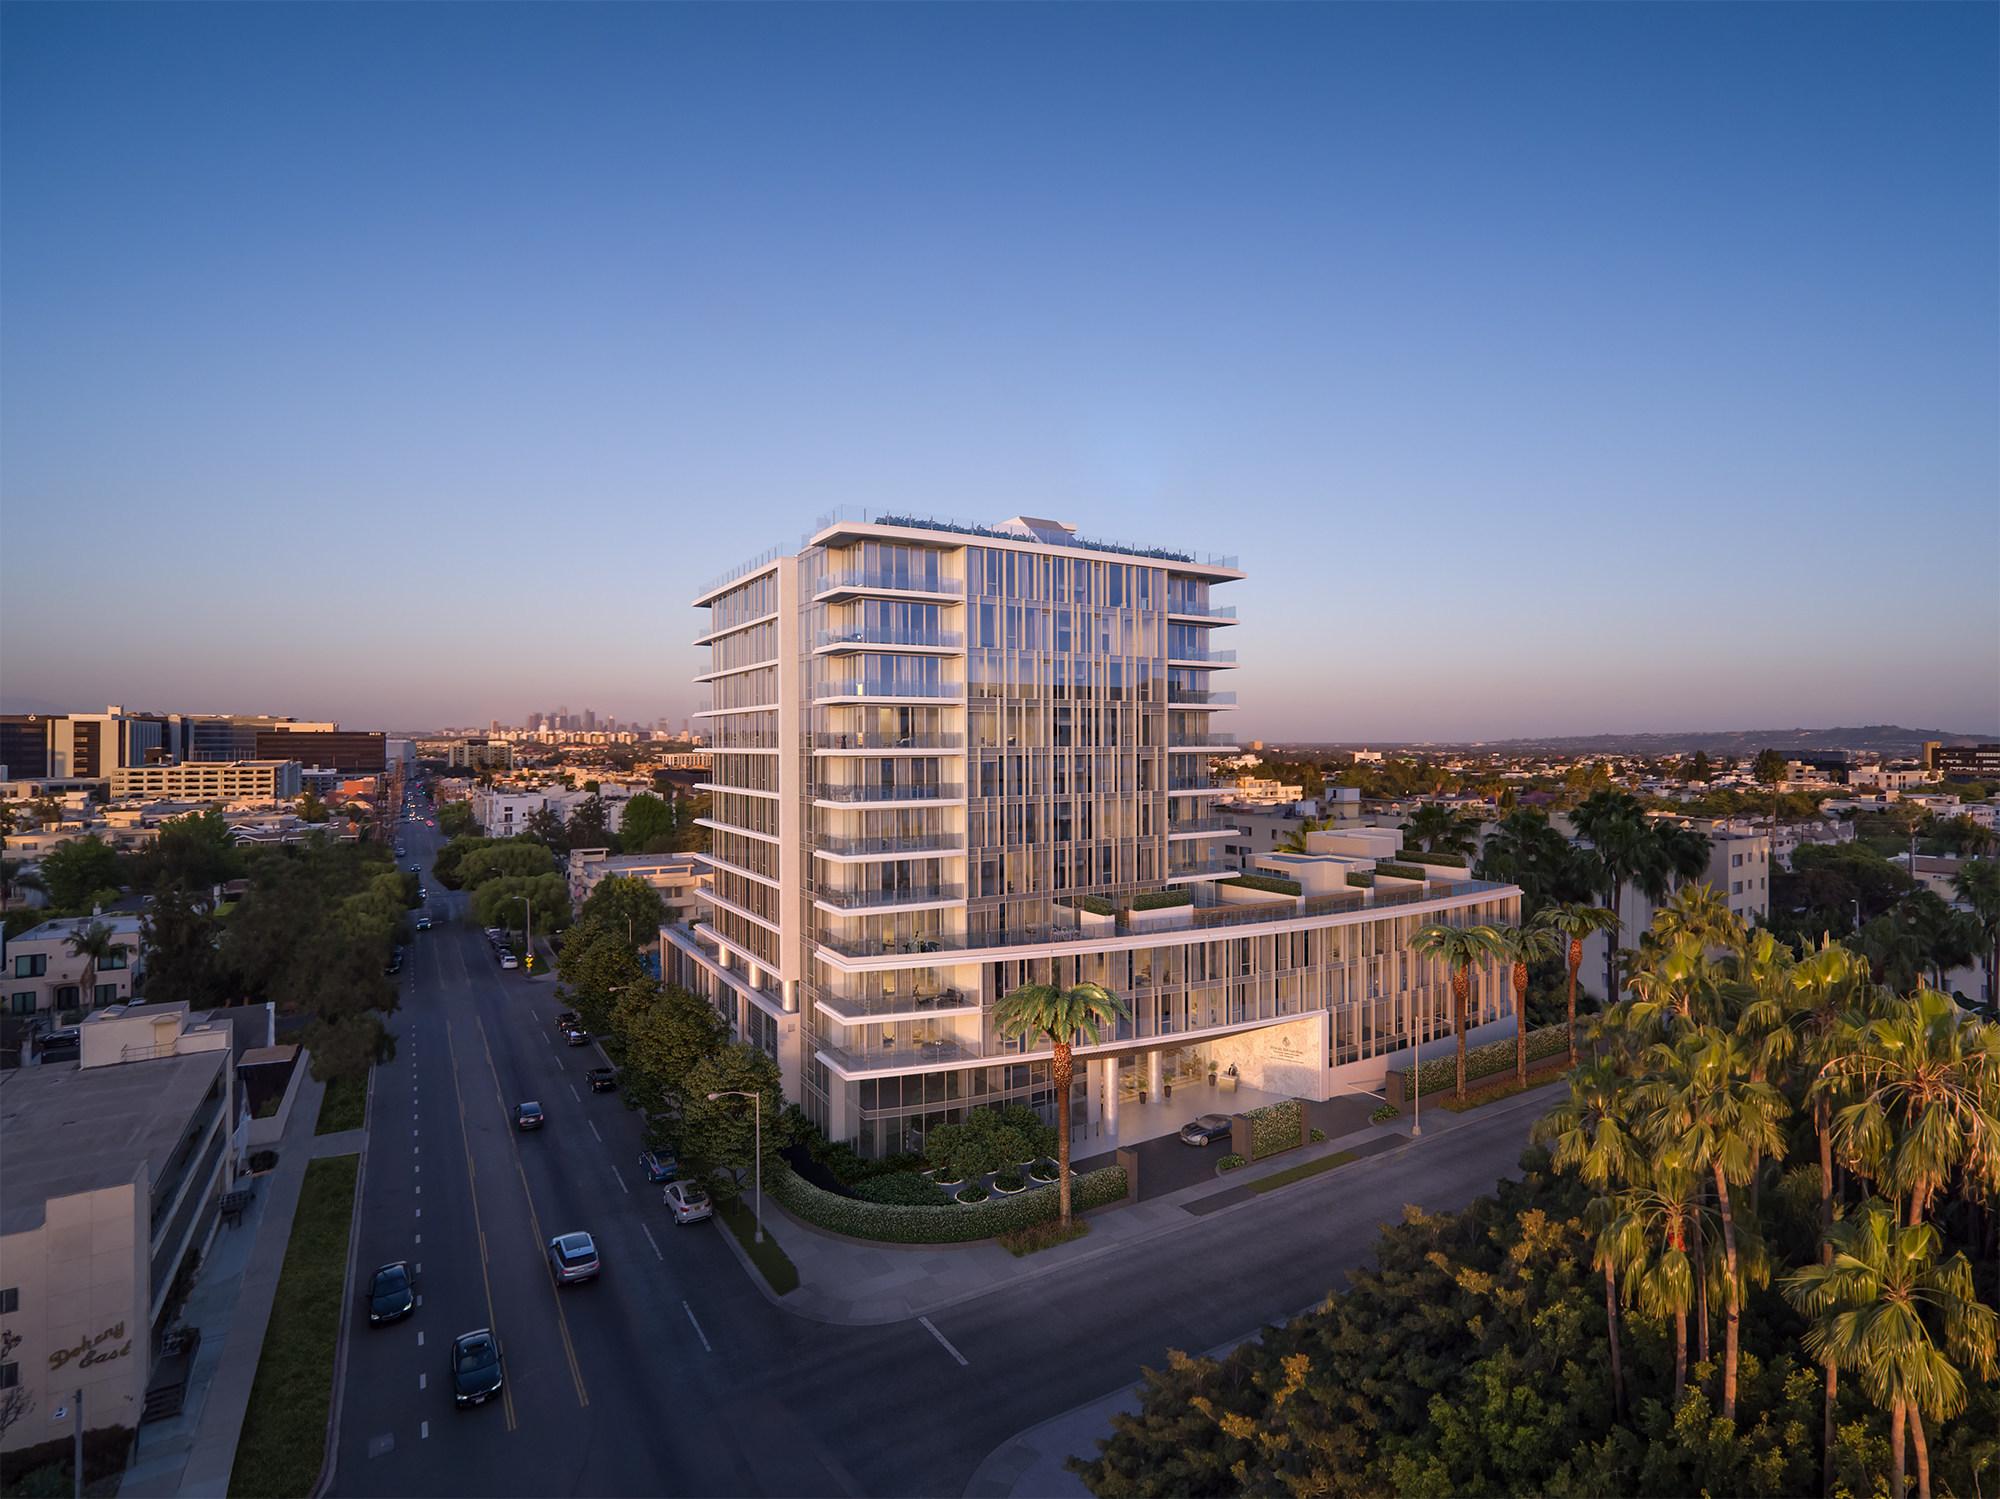 Four_Seasons_Private_Residences_Los_Angeles.jpg